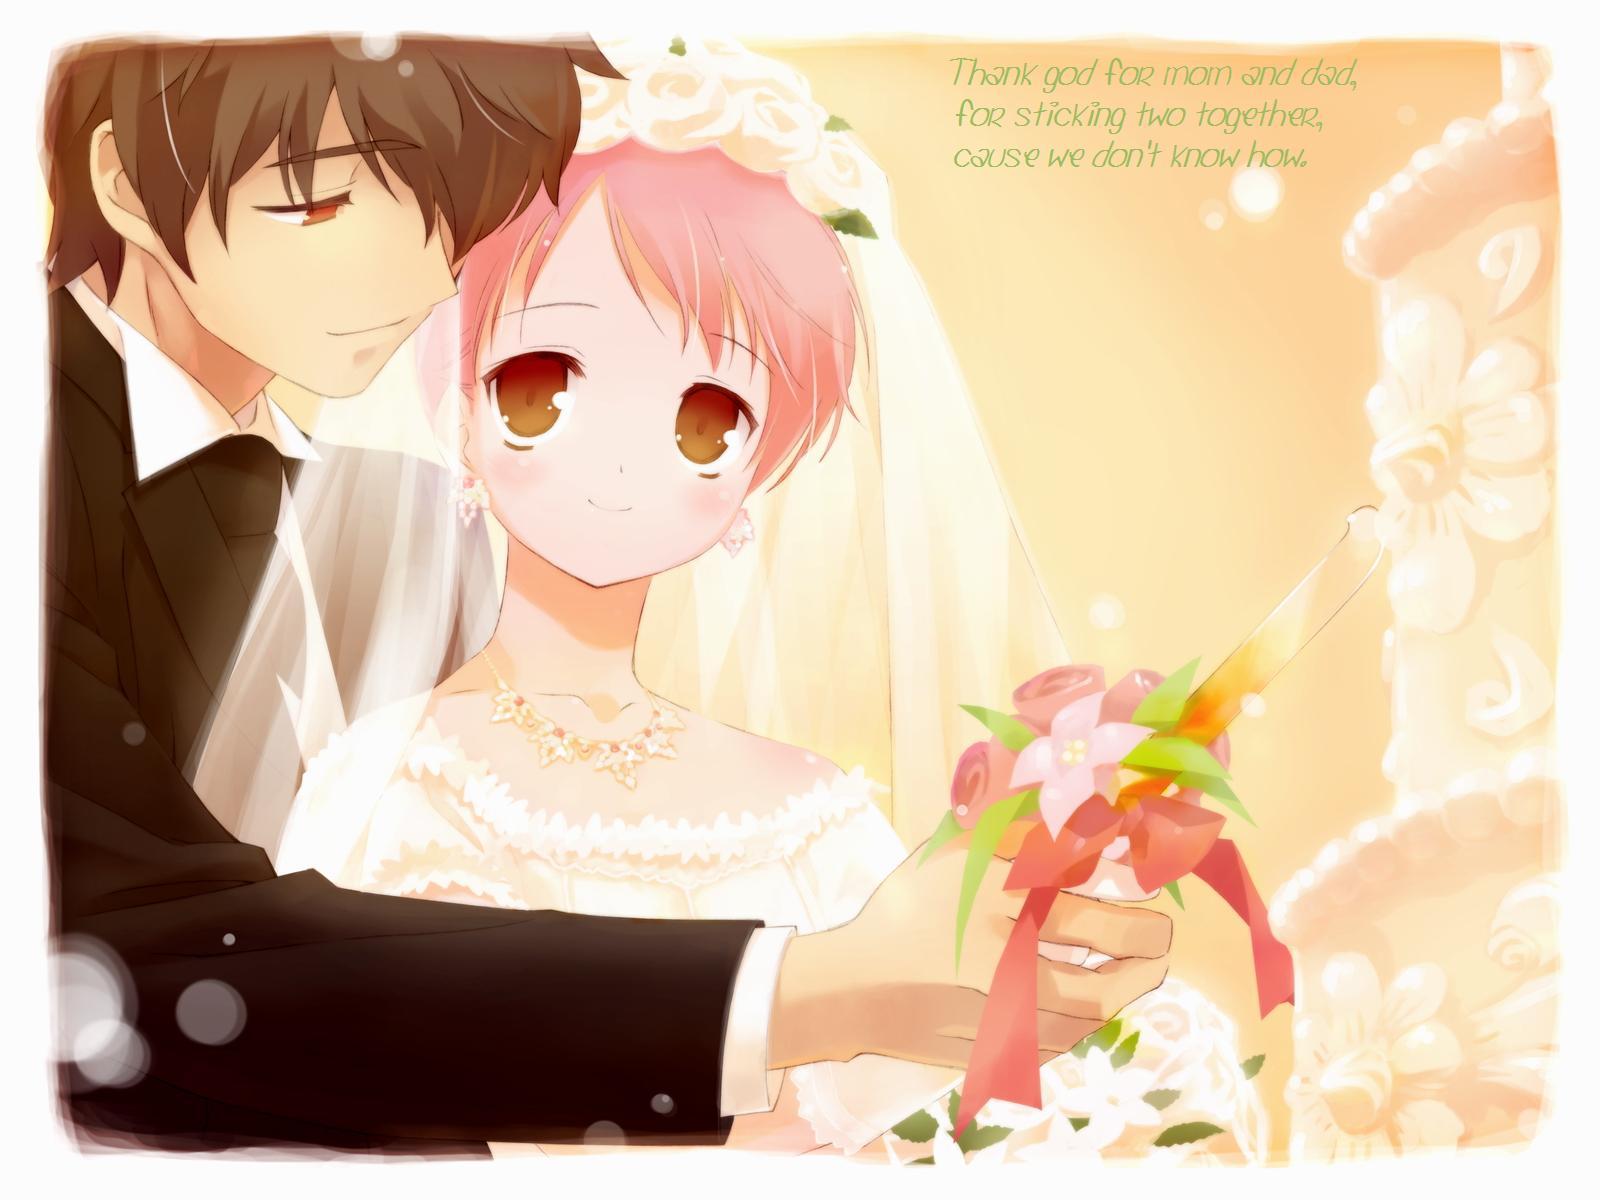 http://2.bp.blogspot.com/-77rC75gnGi4/UHC4D37lrqI/AAAAAAAAAPA/s9NdXygrrqU/s1600/anime+love+9.jpg